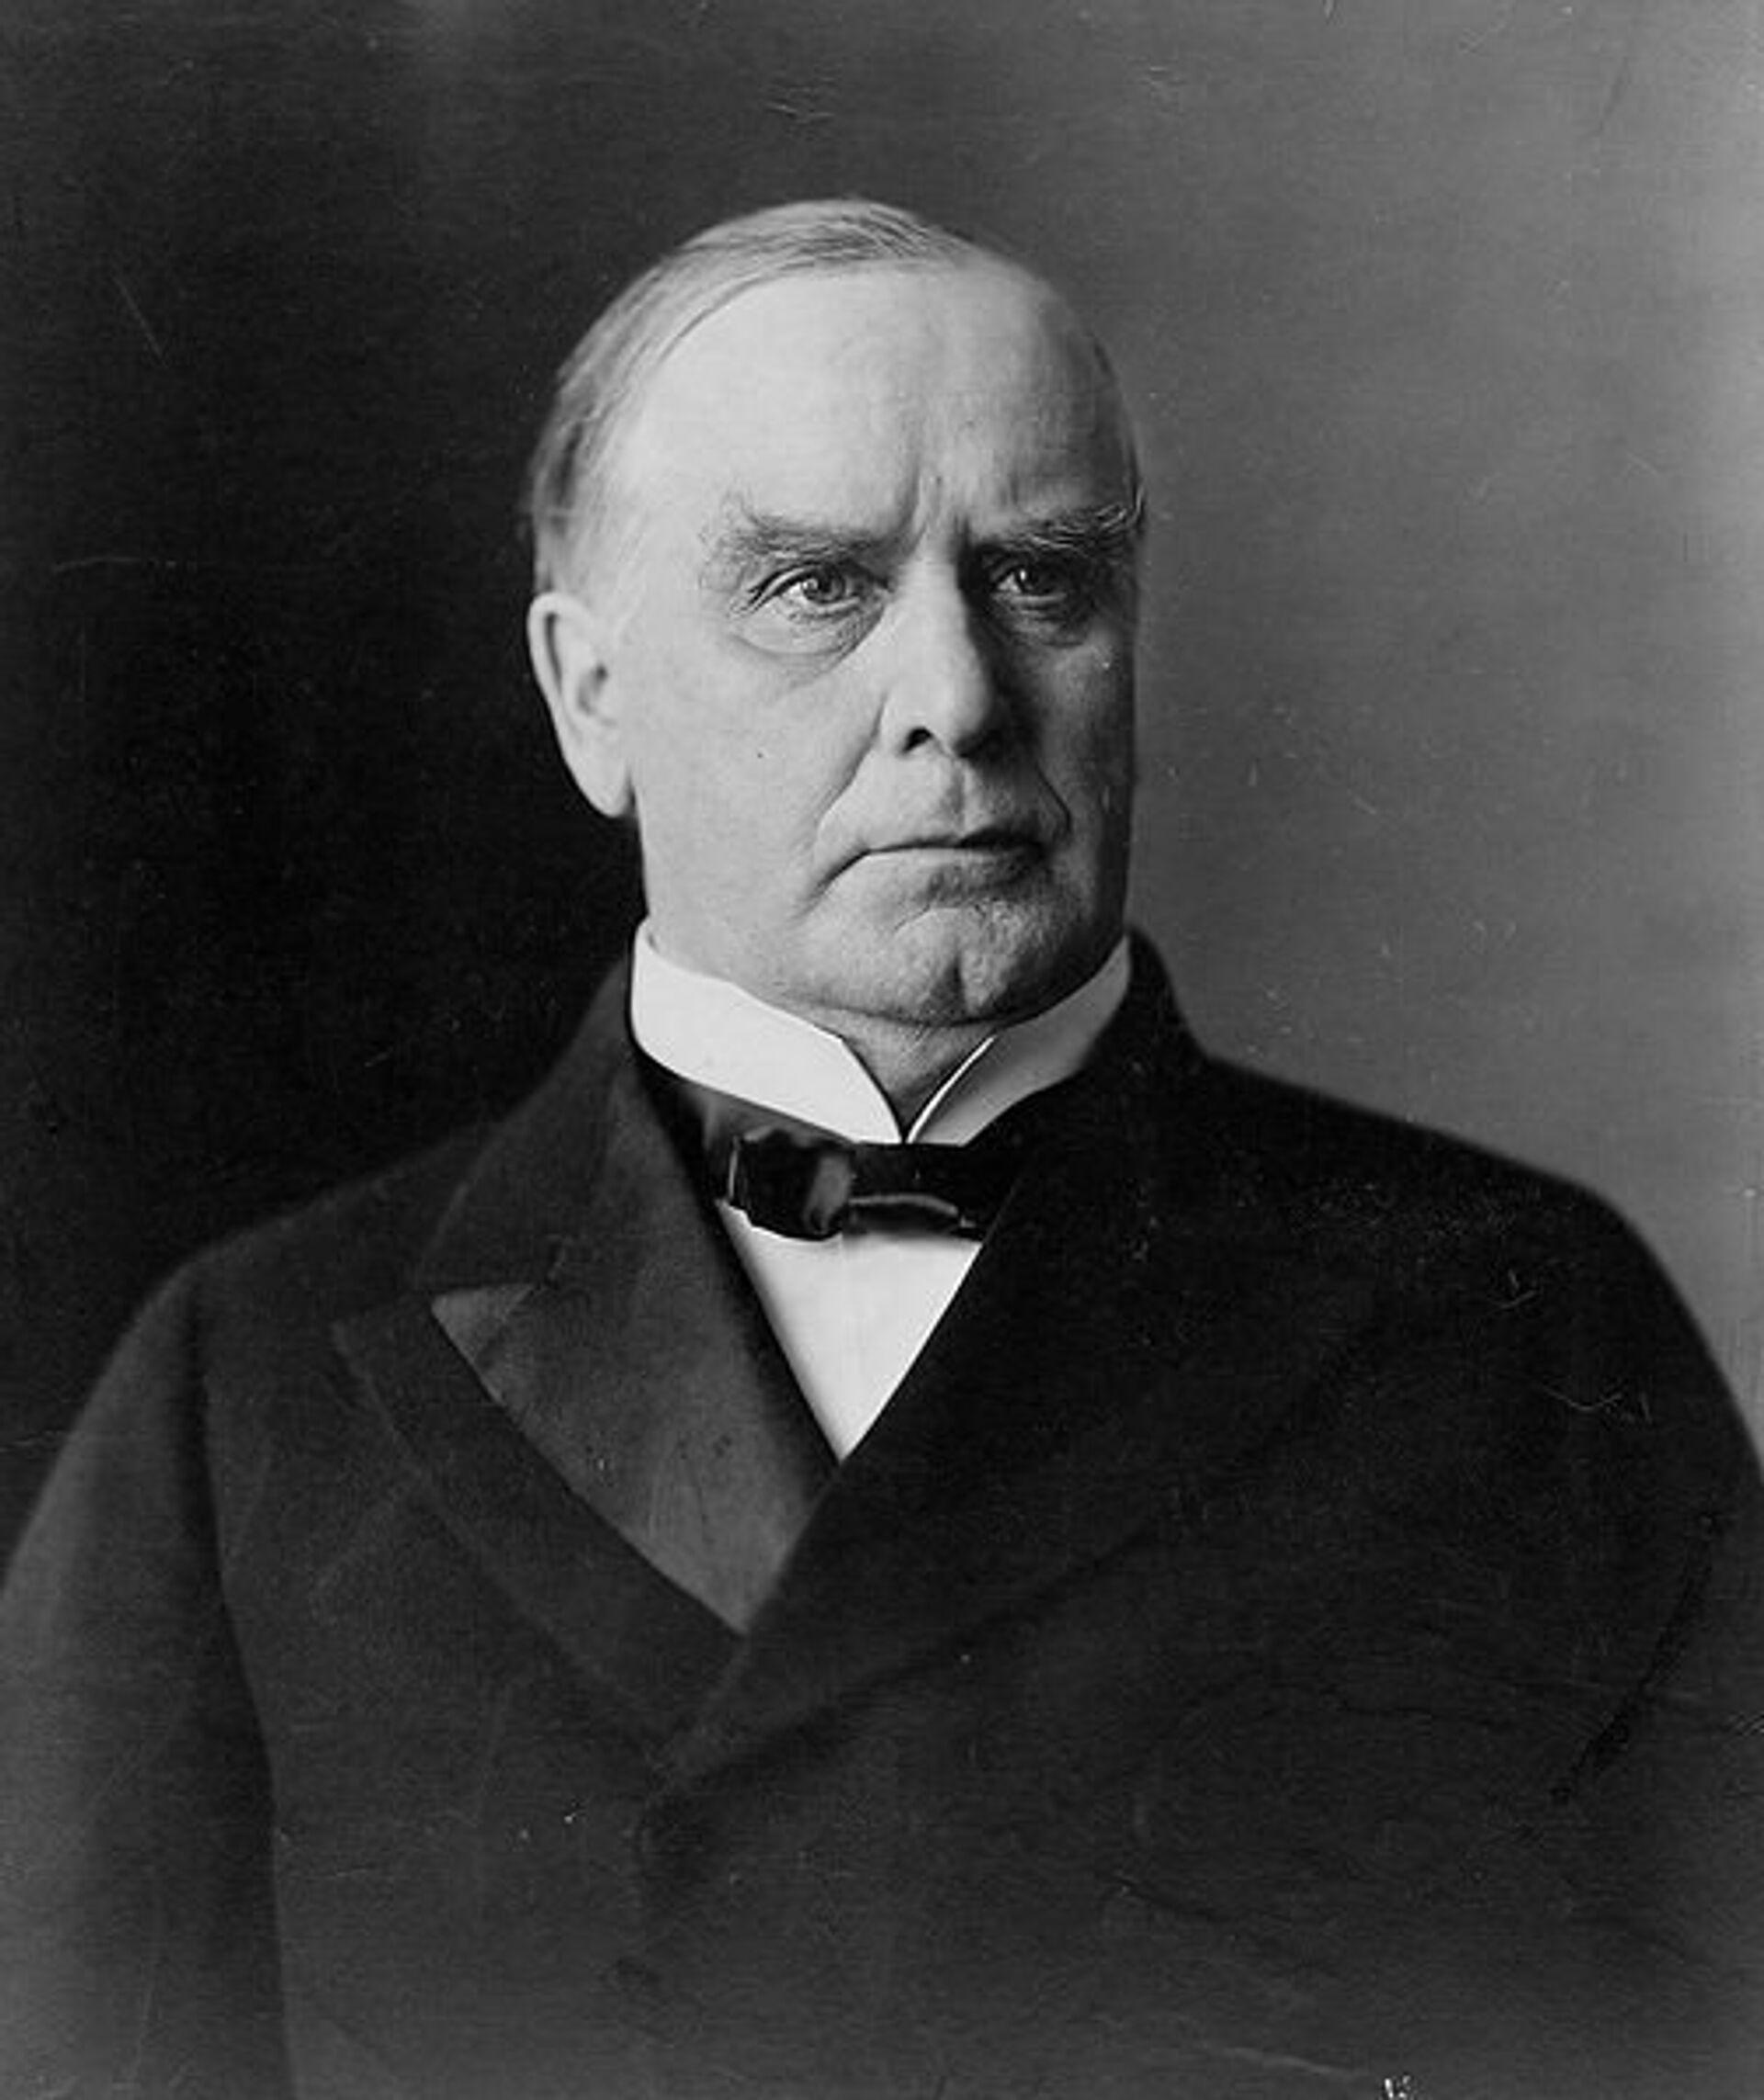 25-й президент США Уильям МакКинли - РИА Новости, 1920, 06.04.2021